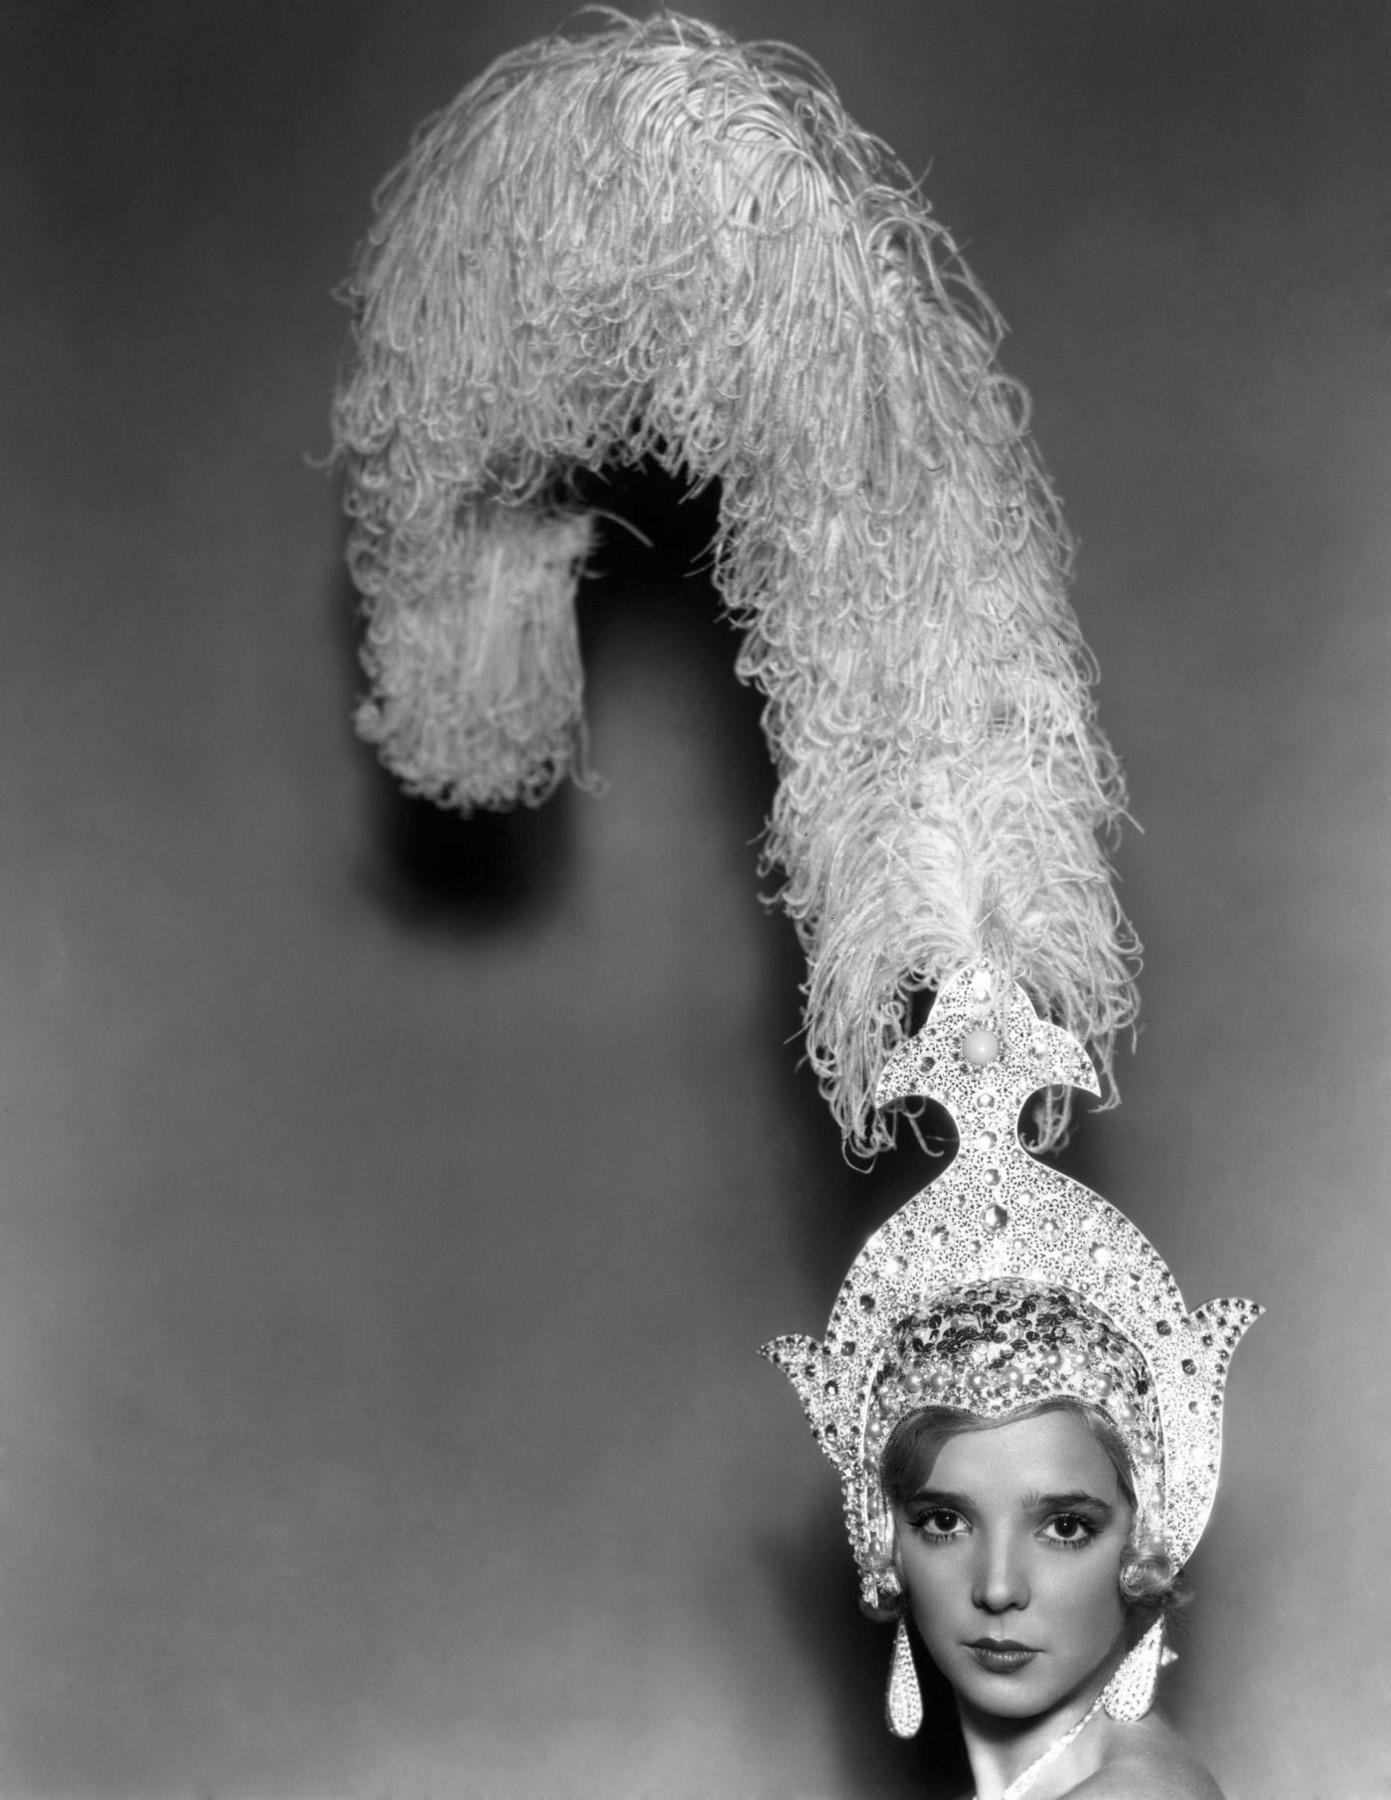 Sumbul Iqbal,Pat Evison Erotic photos Adrienne Marden,Isa Barzizza (born 1929)